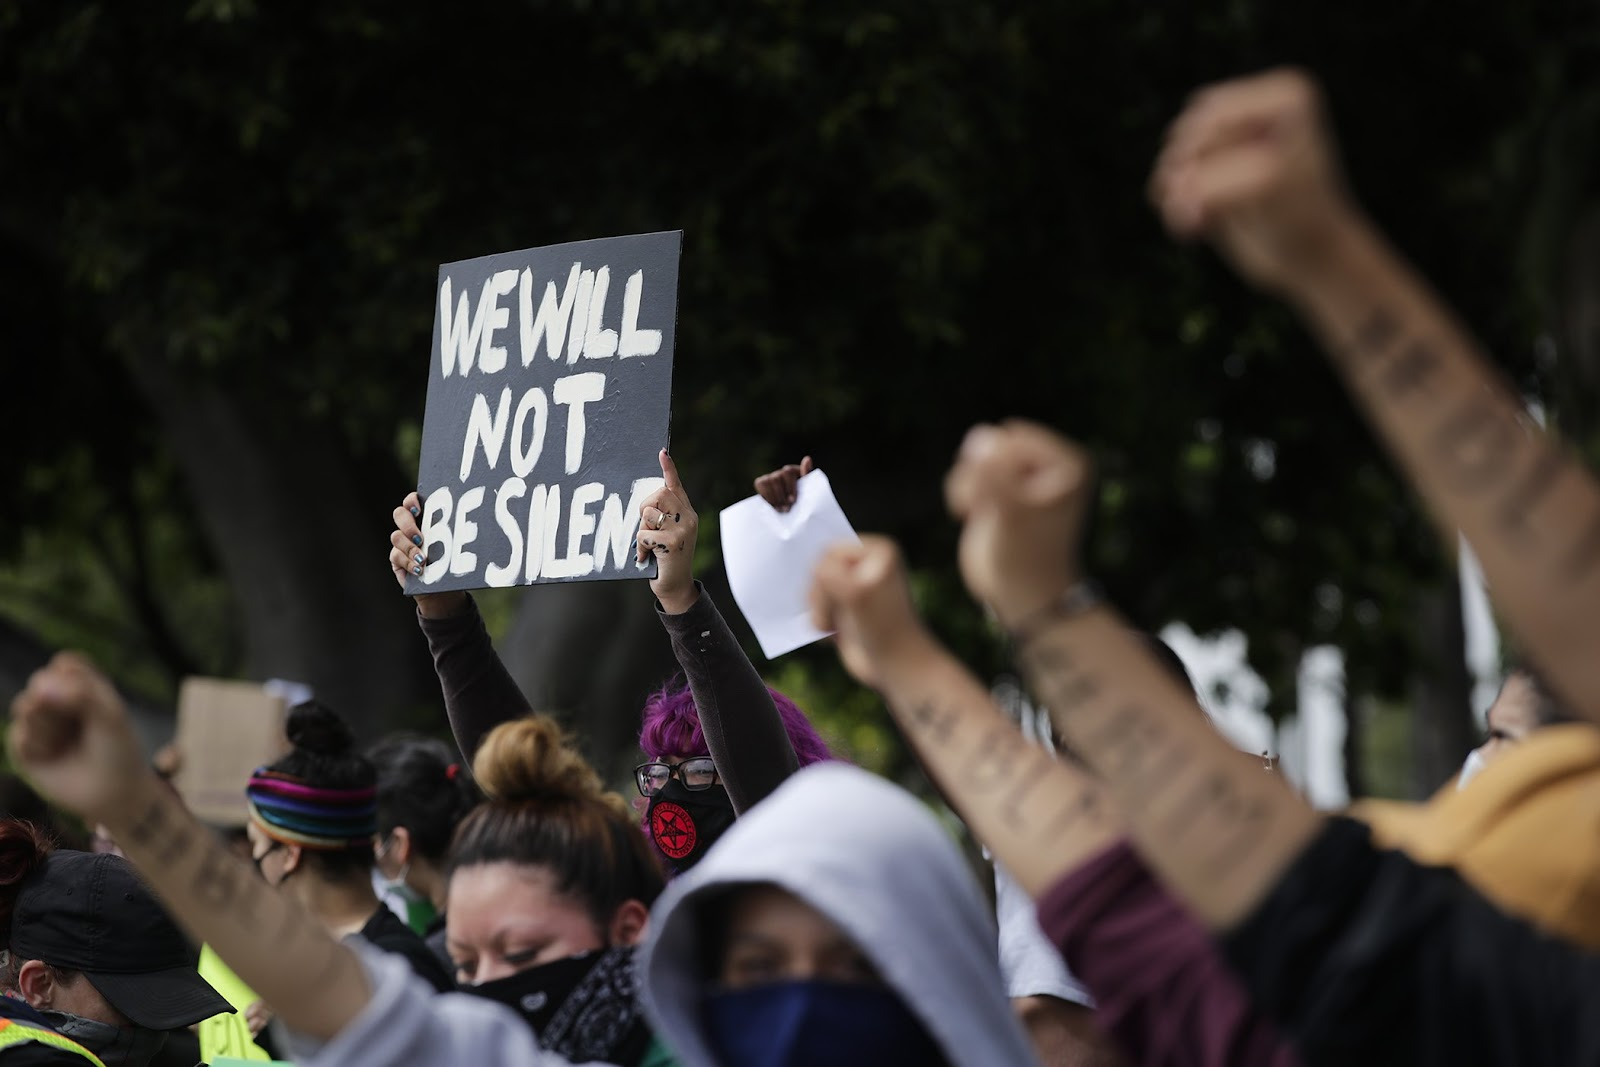 George-Floyd-Protests-Activism-Social-Justice-007.jpg